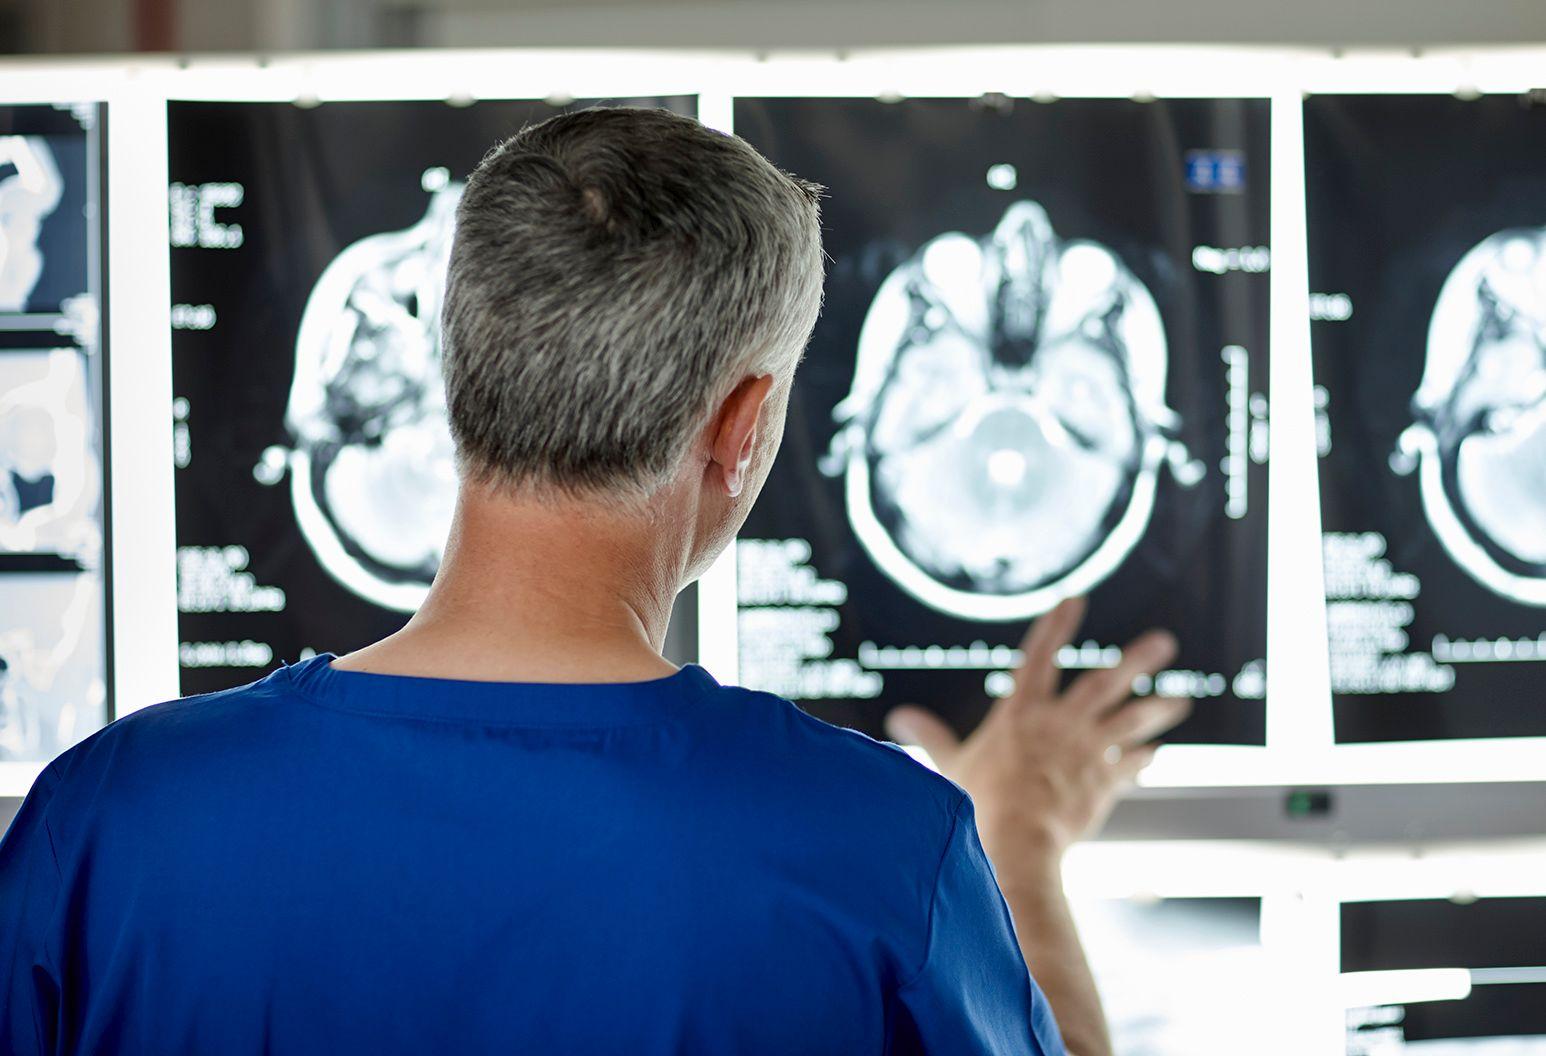 Radiologist examines a brain scan